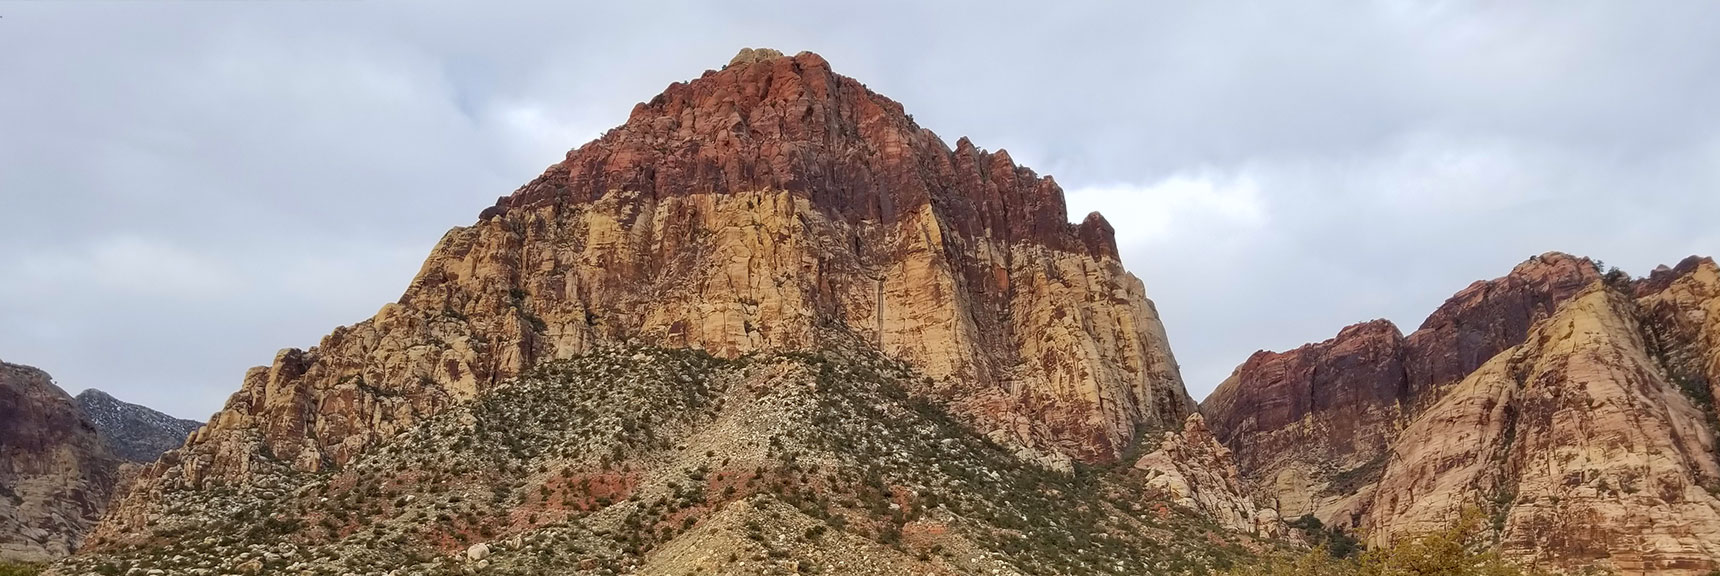 Rainbow Mountain and Juniper Peak, Rainbow Mountain Wilderness, Nevada